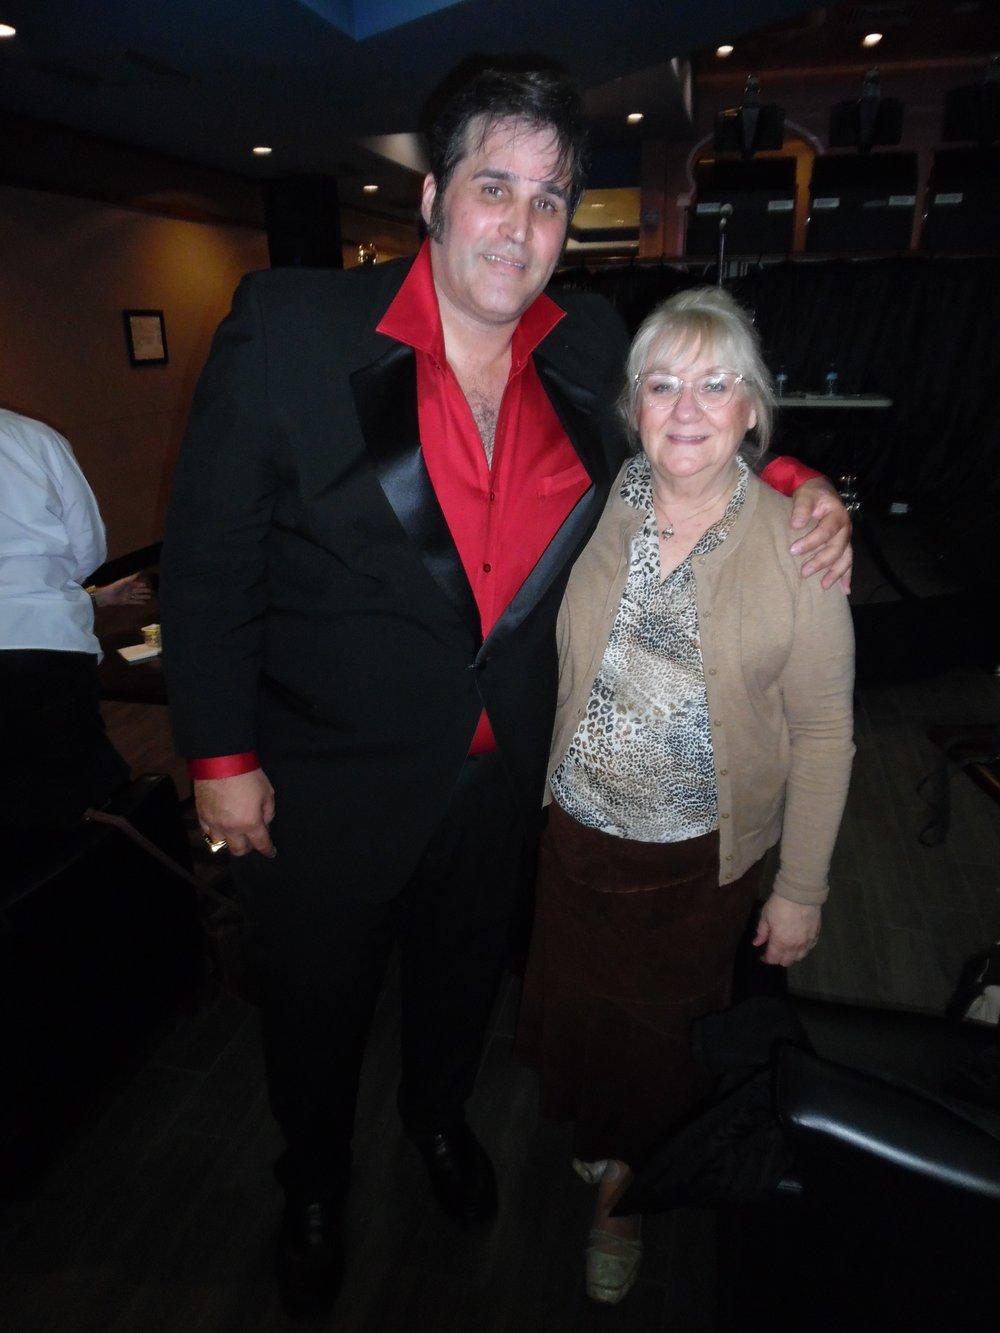 ETA  Anthony Von  with Carolyn MacArthur, Editor, SIDEBURNS Magazine.